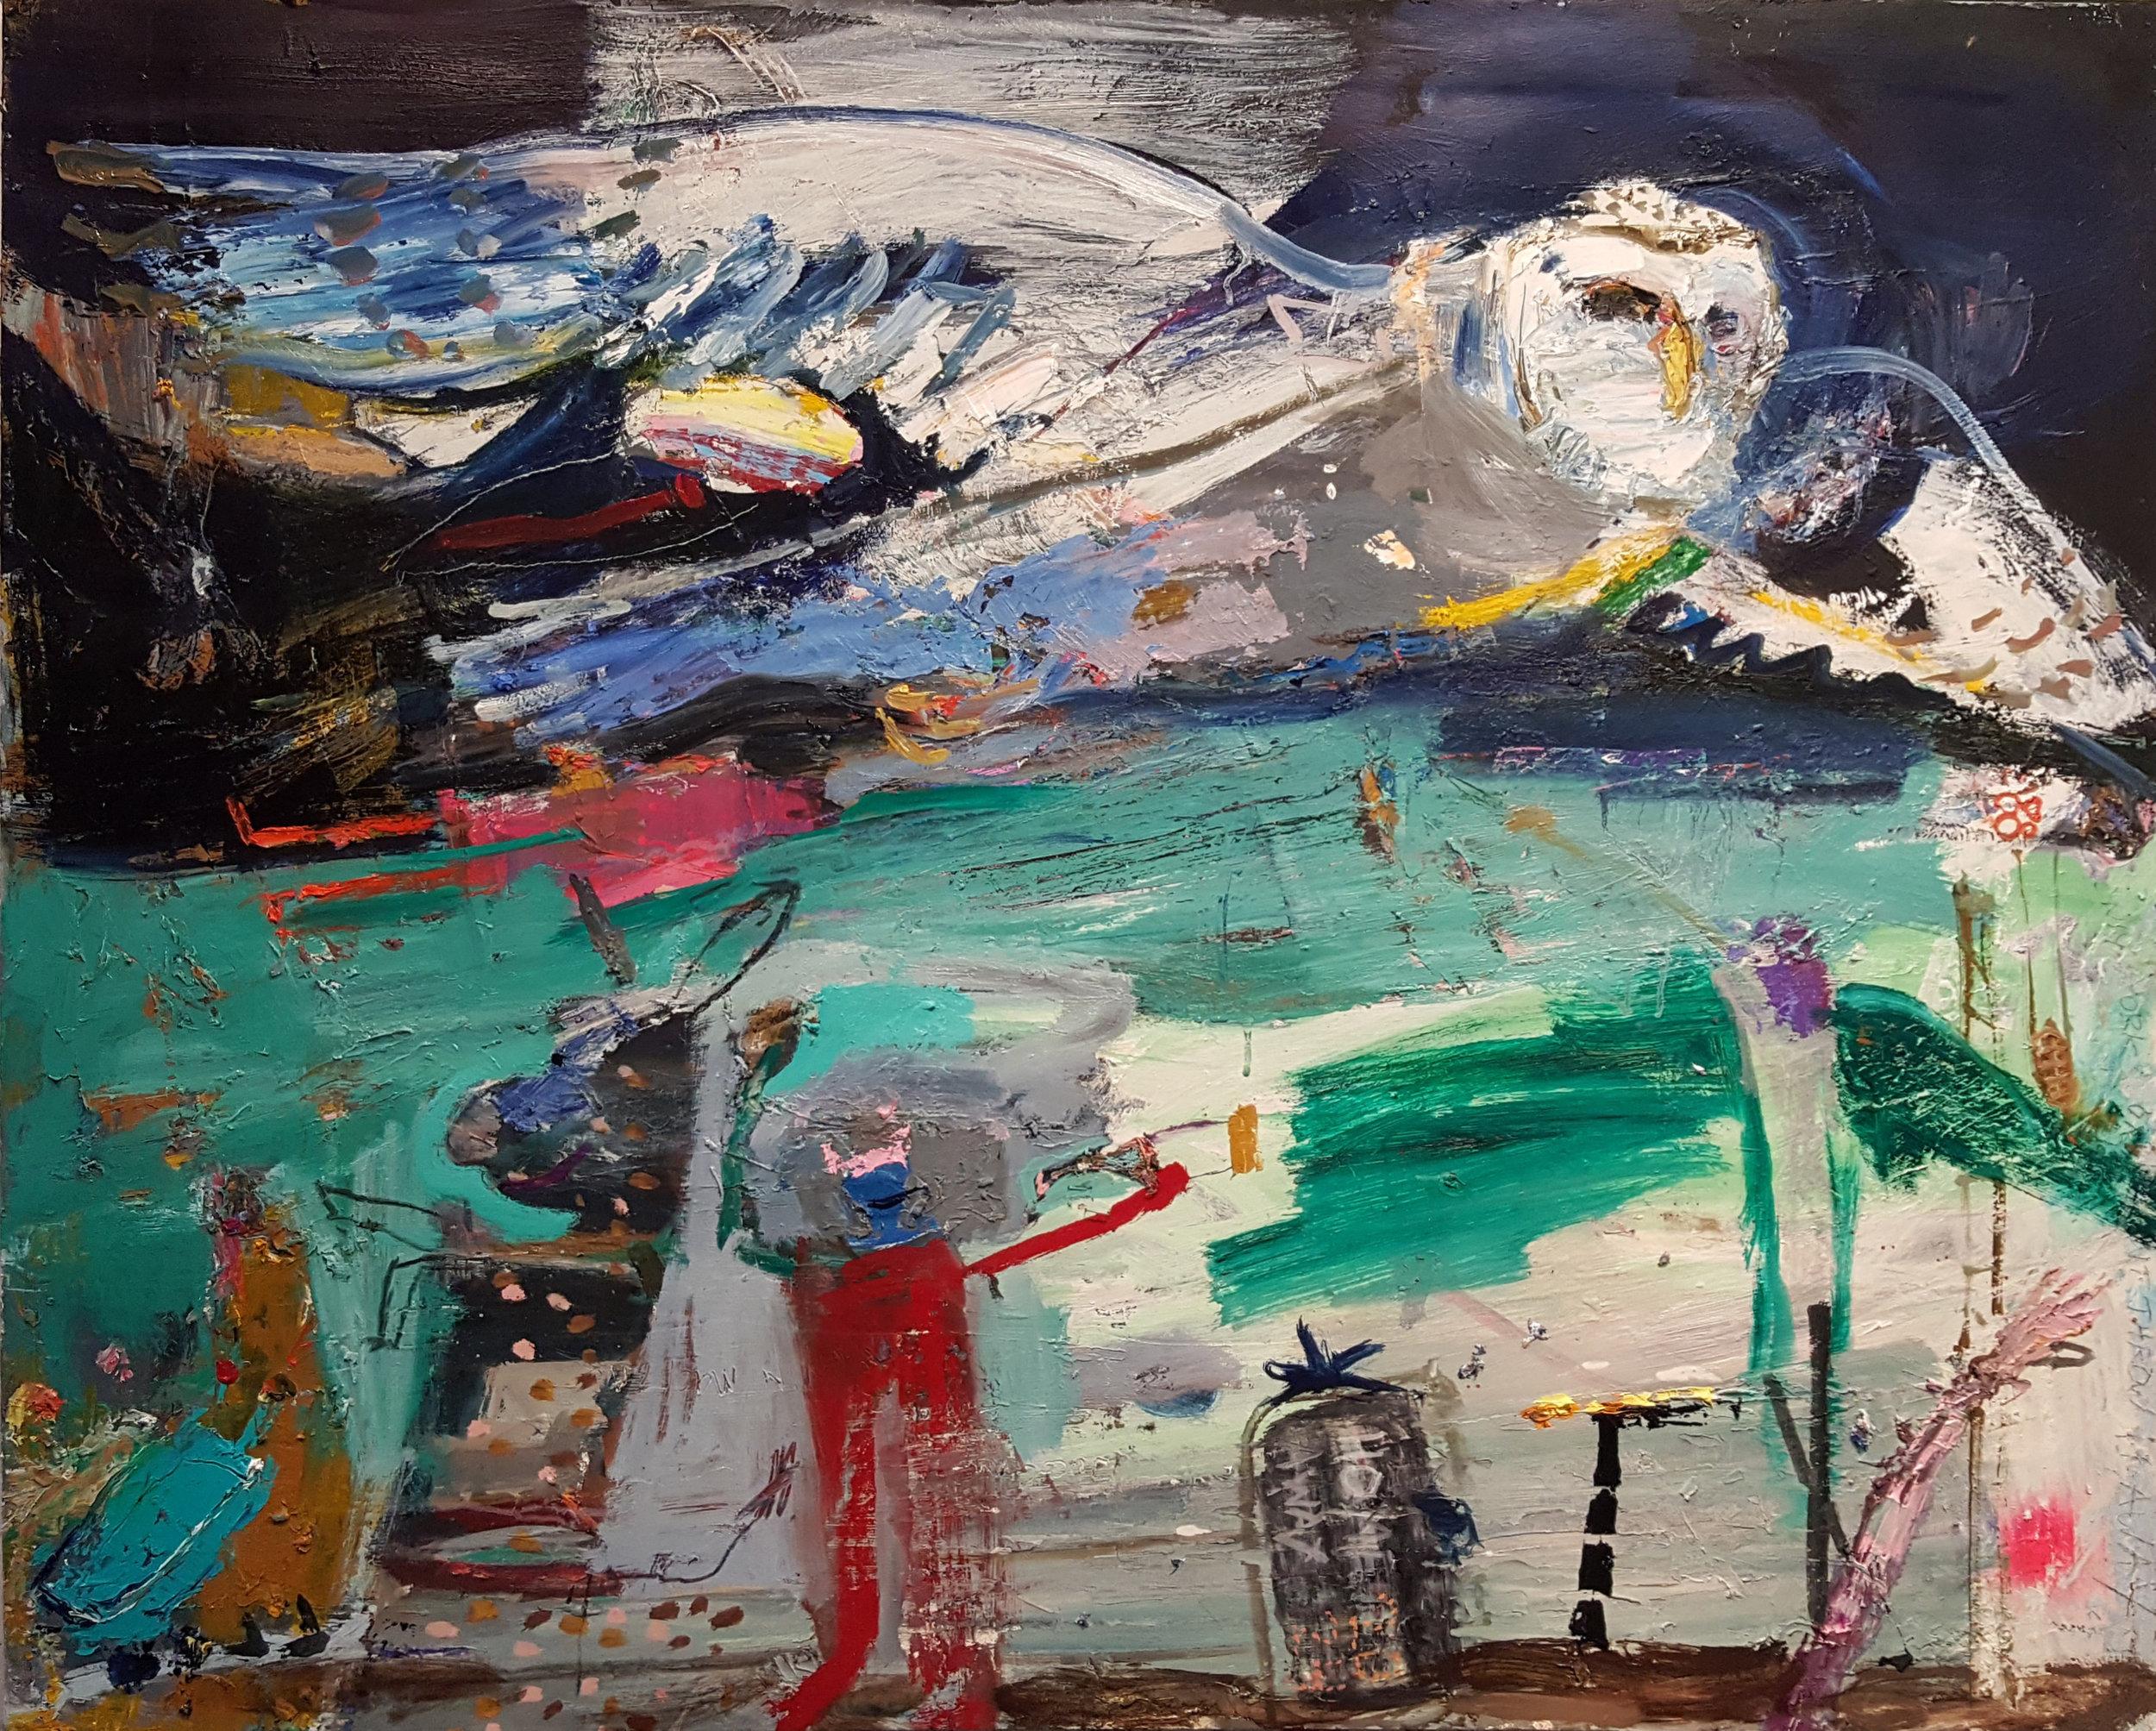 Matt Blackwell,  Owl,  Oil on paper on canvas, 30h x 40w in.